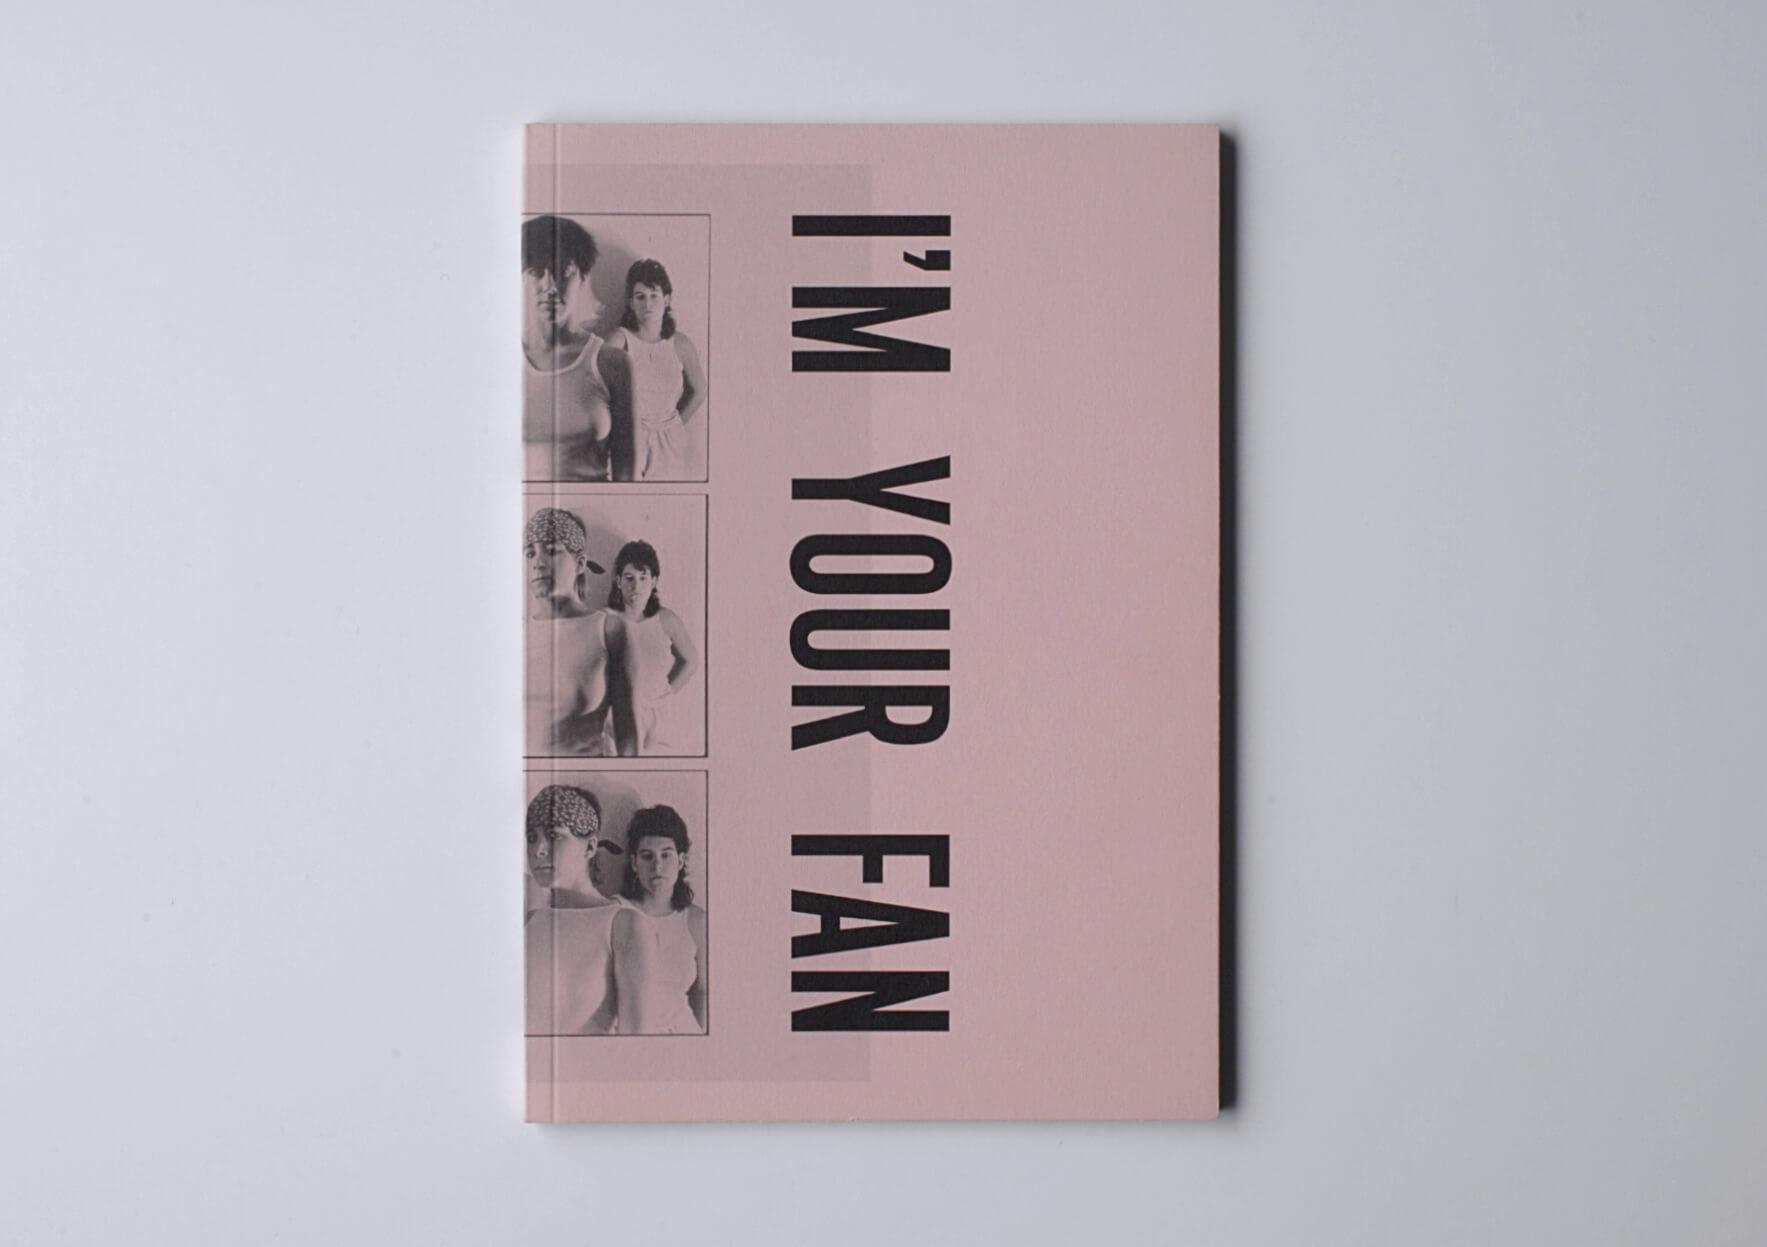 Moyra Davey I am your fan, 2014 14,5 x 20,5 cm, 46 p. Ed. Camden Arts Centre/Camilla Wills | Mother | ProjecteSD